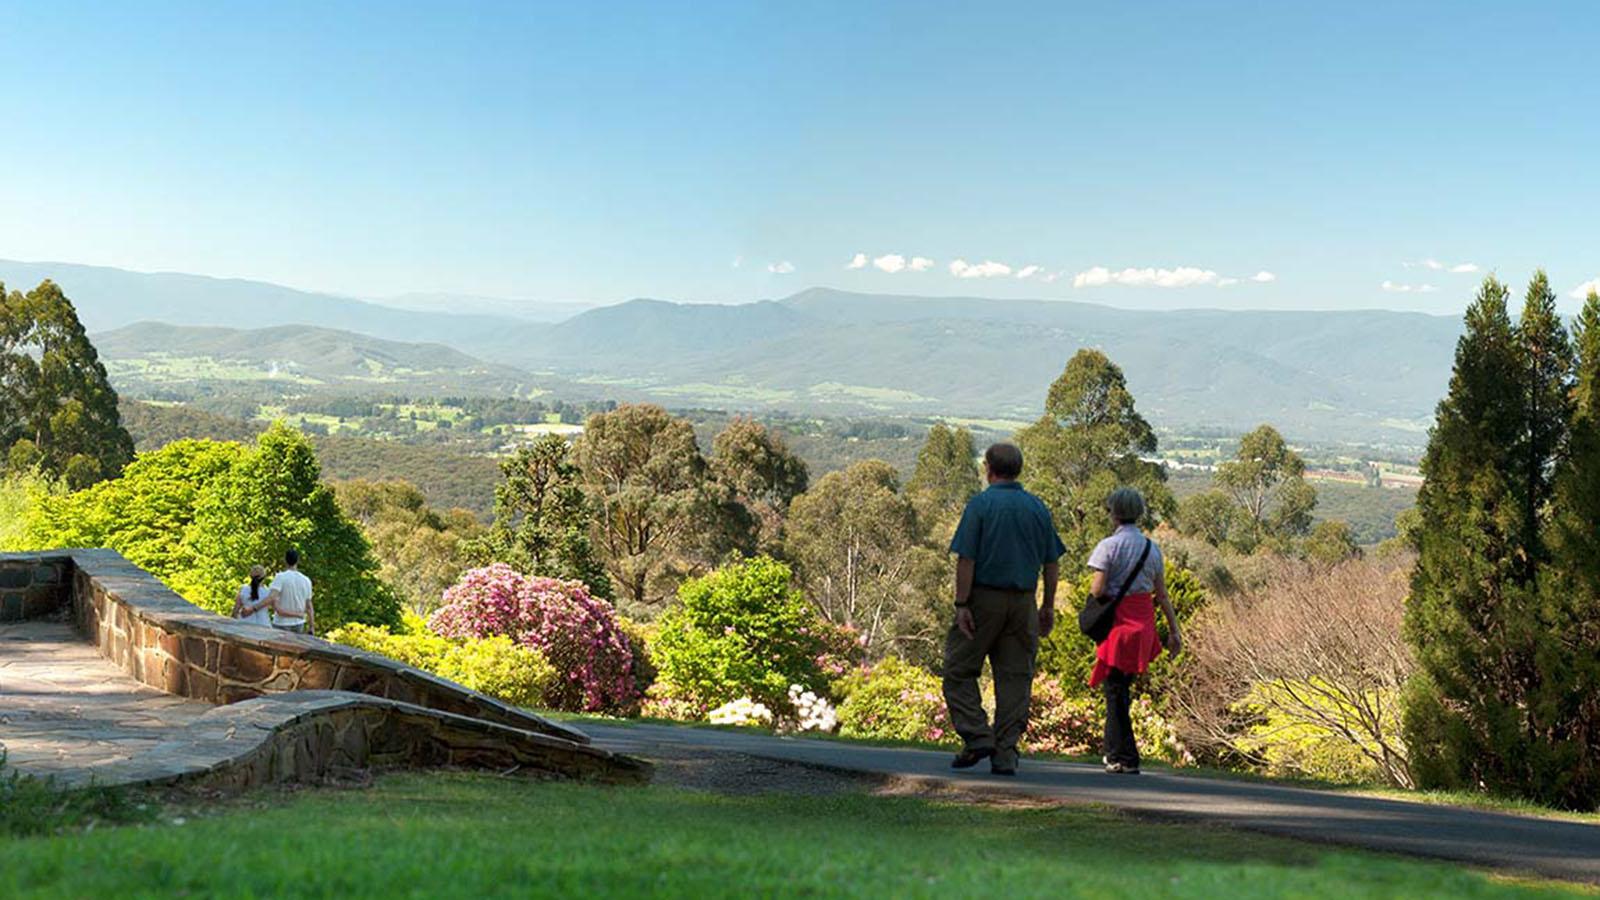 National Rhododendron Gardens, Yarr Valley & Dandenong Ranges, Victoria, Australia